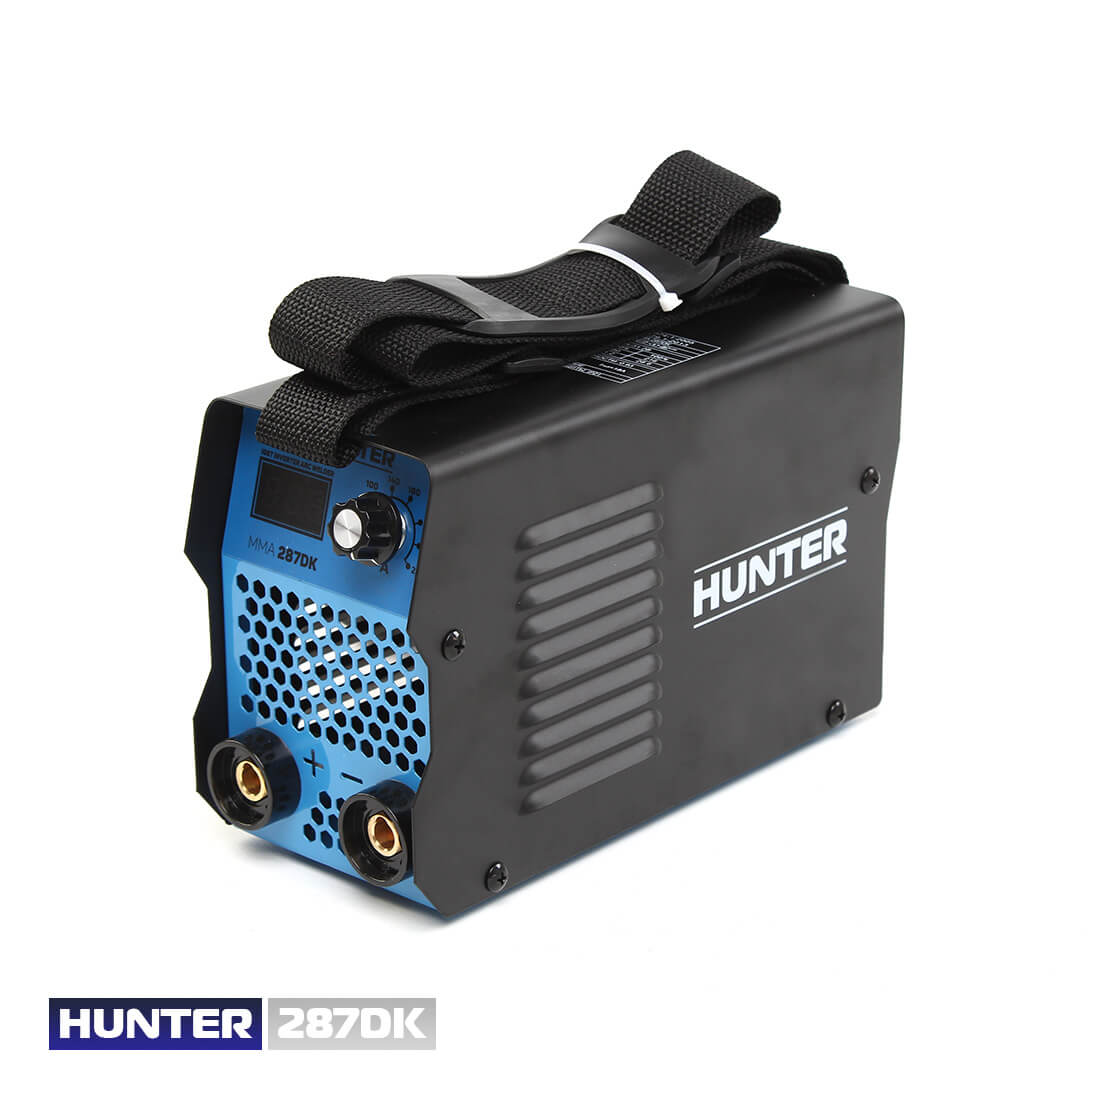 Фото Hunter MMA 287DK (дуговая) цена 2550грн №2 — Hunter